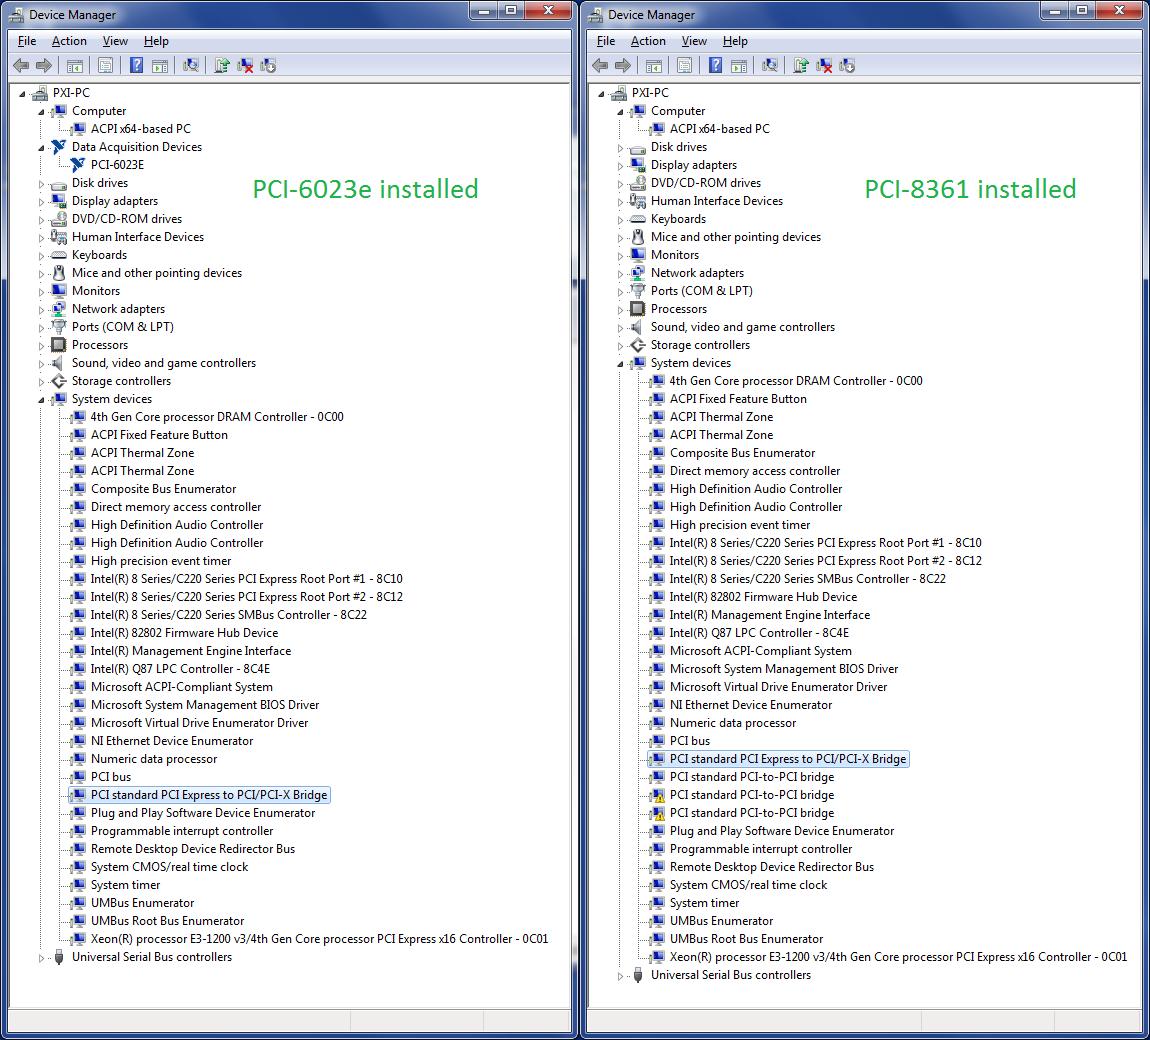 Solved: PXI-8360 (MXI-Express) + PCI-8361 + Dell OptiPlex 9020